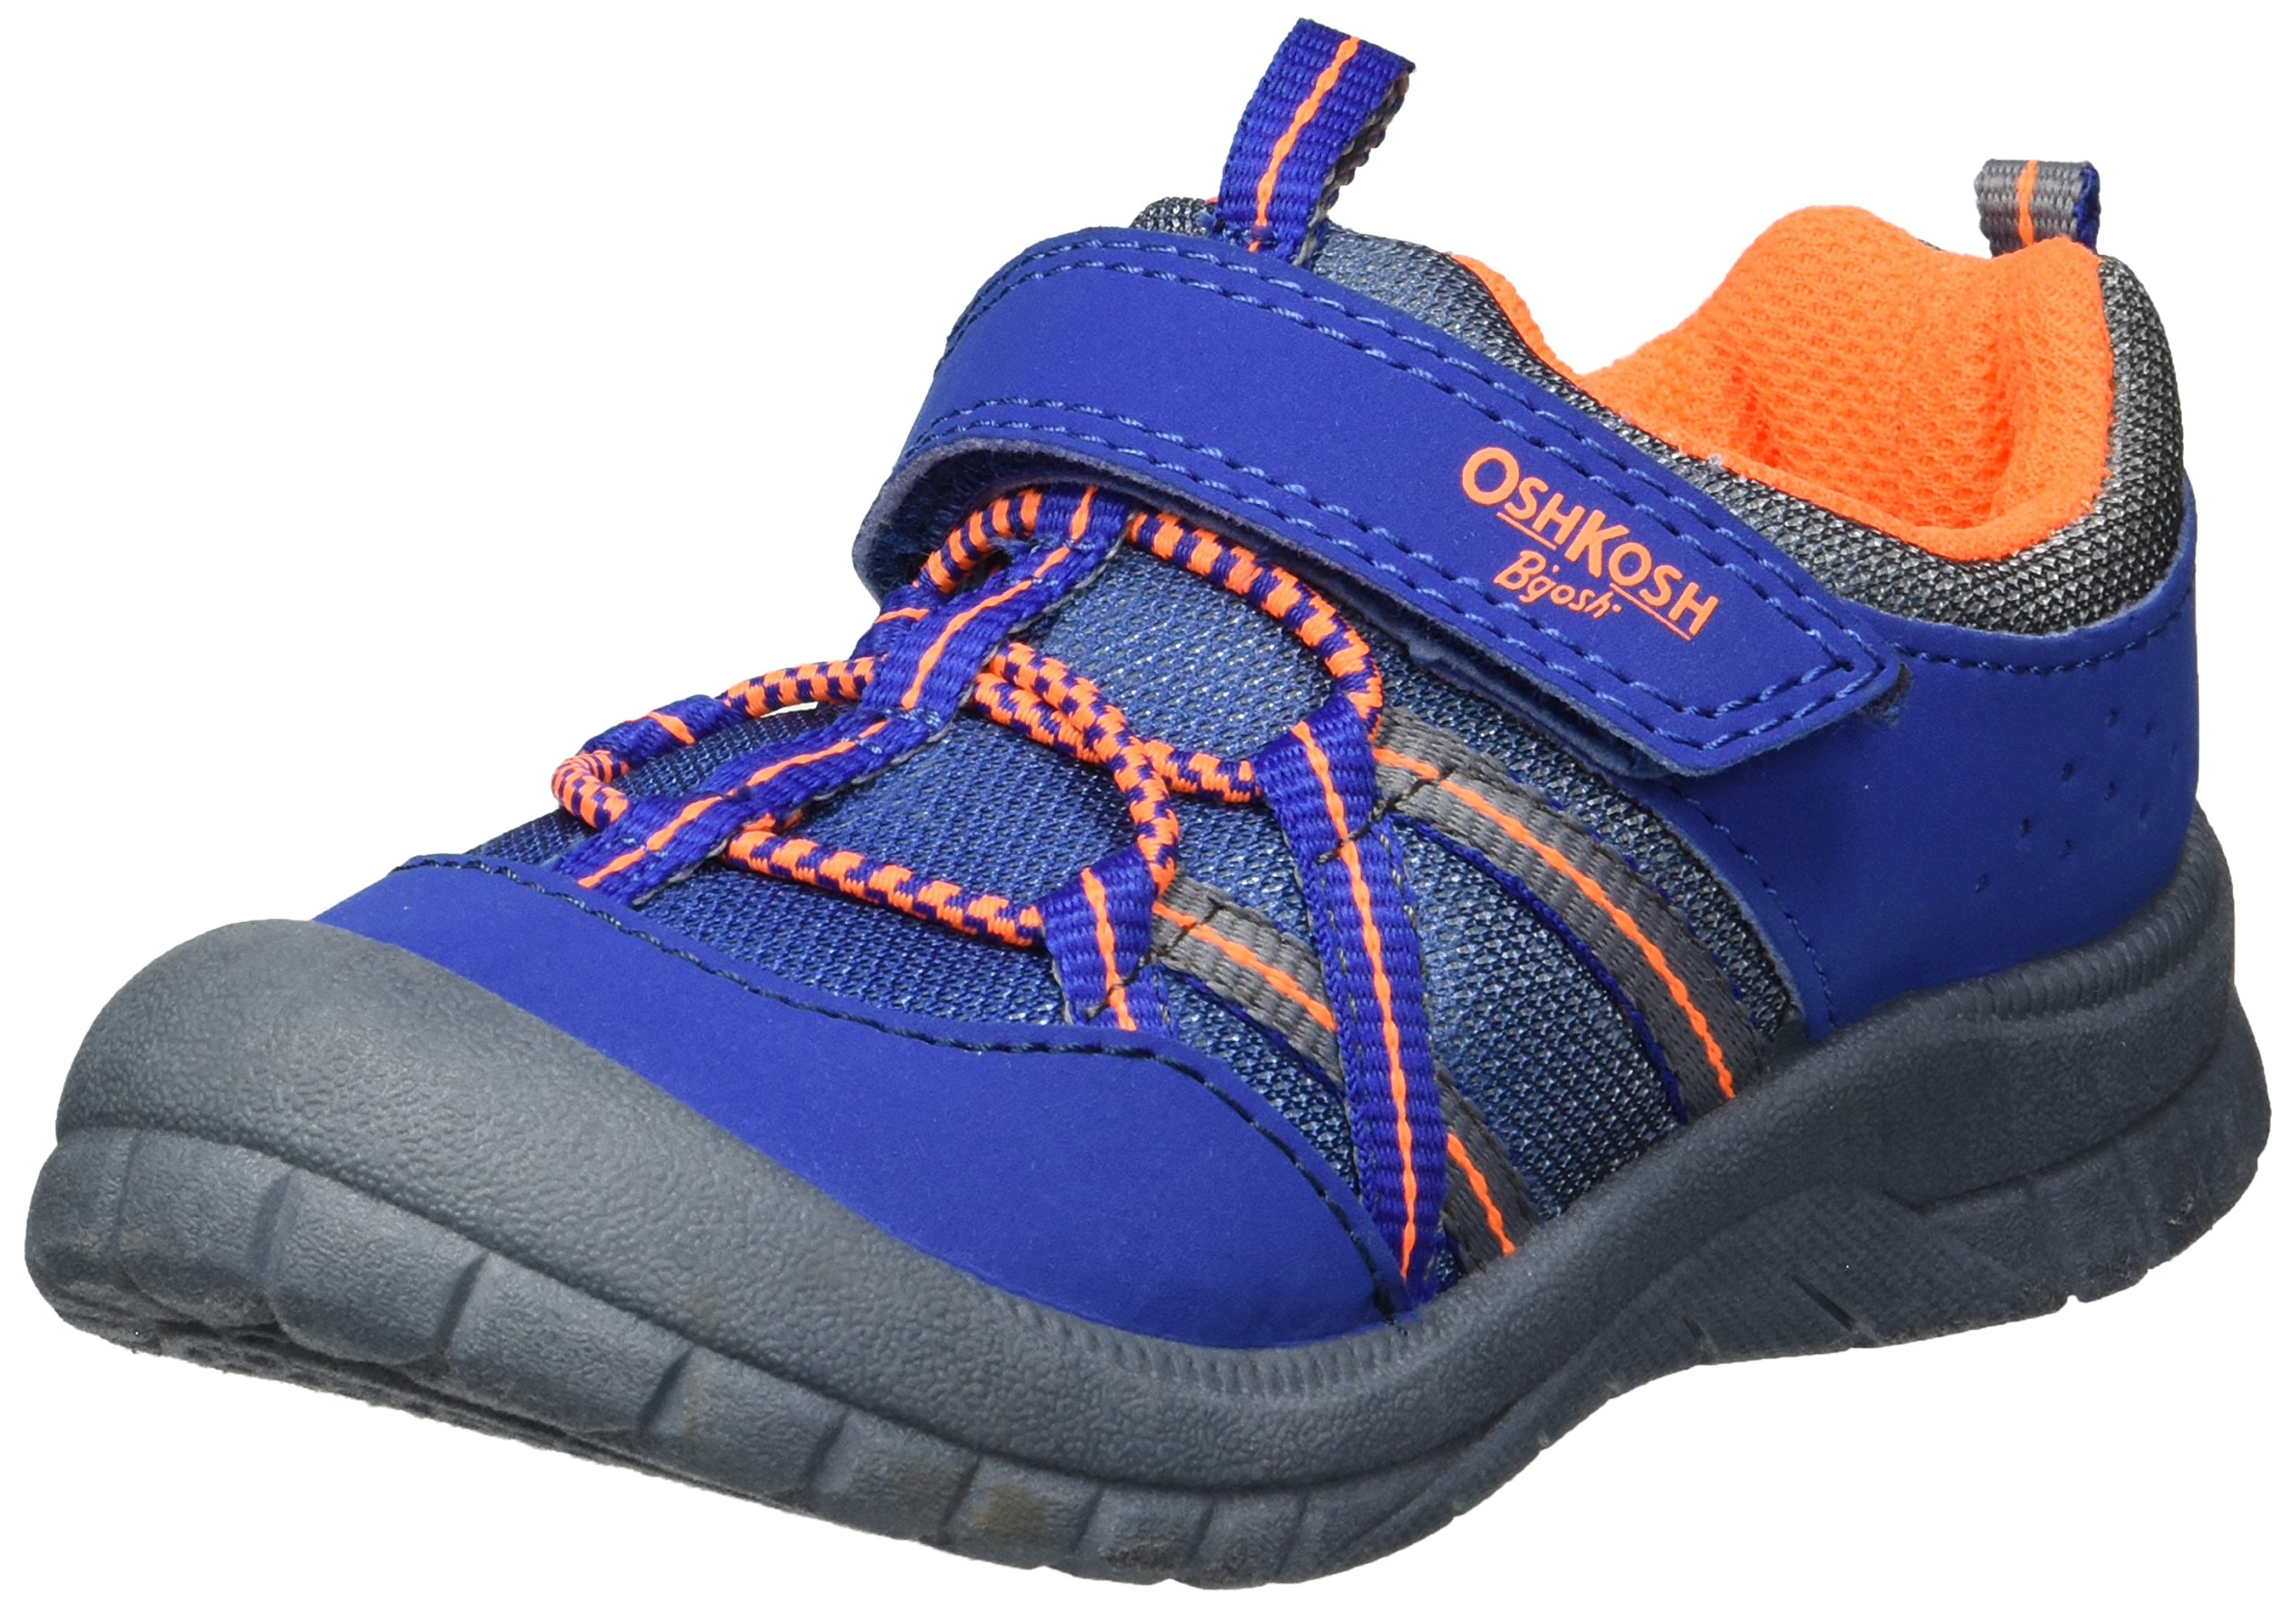 OshKosh B'Gosh Boys' Lazer Bumptoe Athletic Sneaker, Grey, 12 M US Little Kid